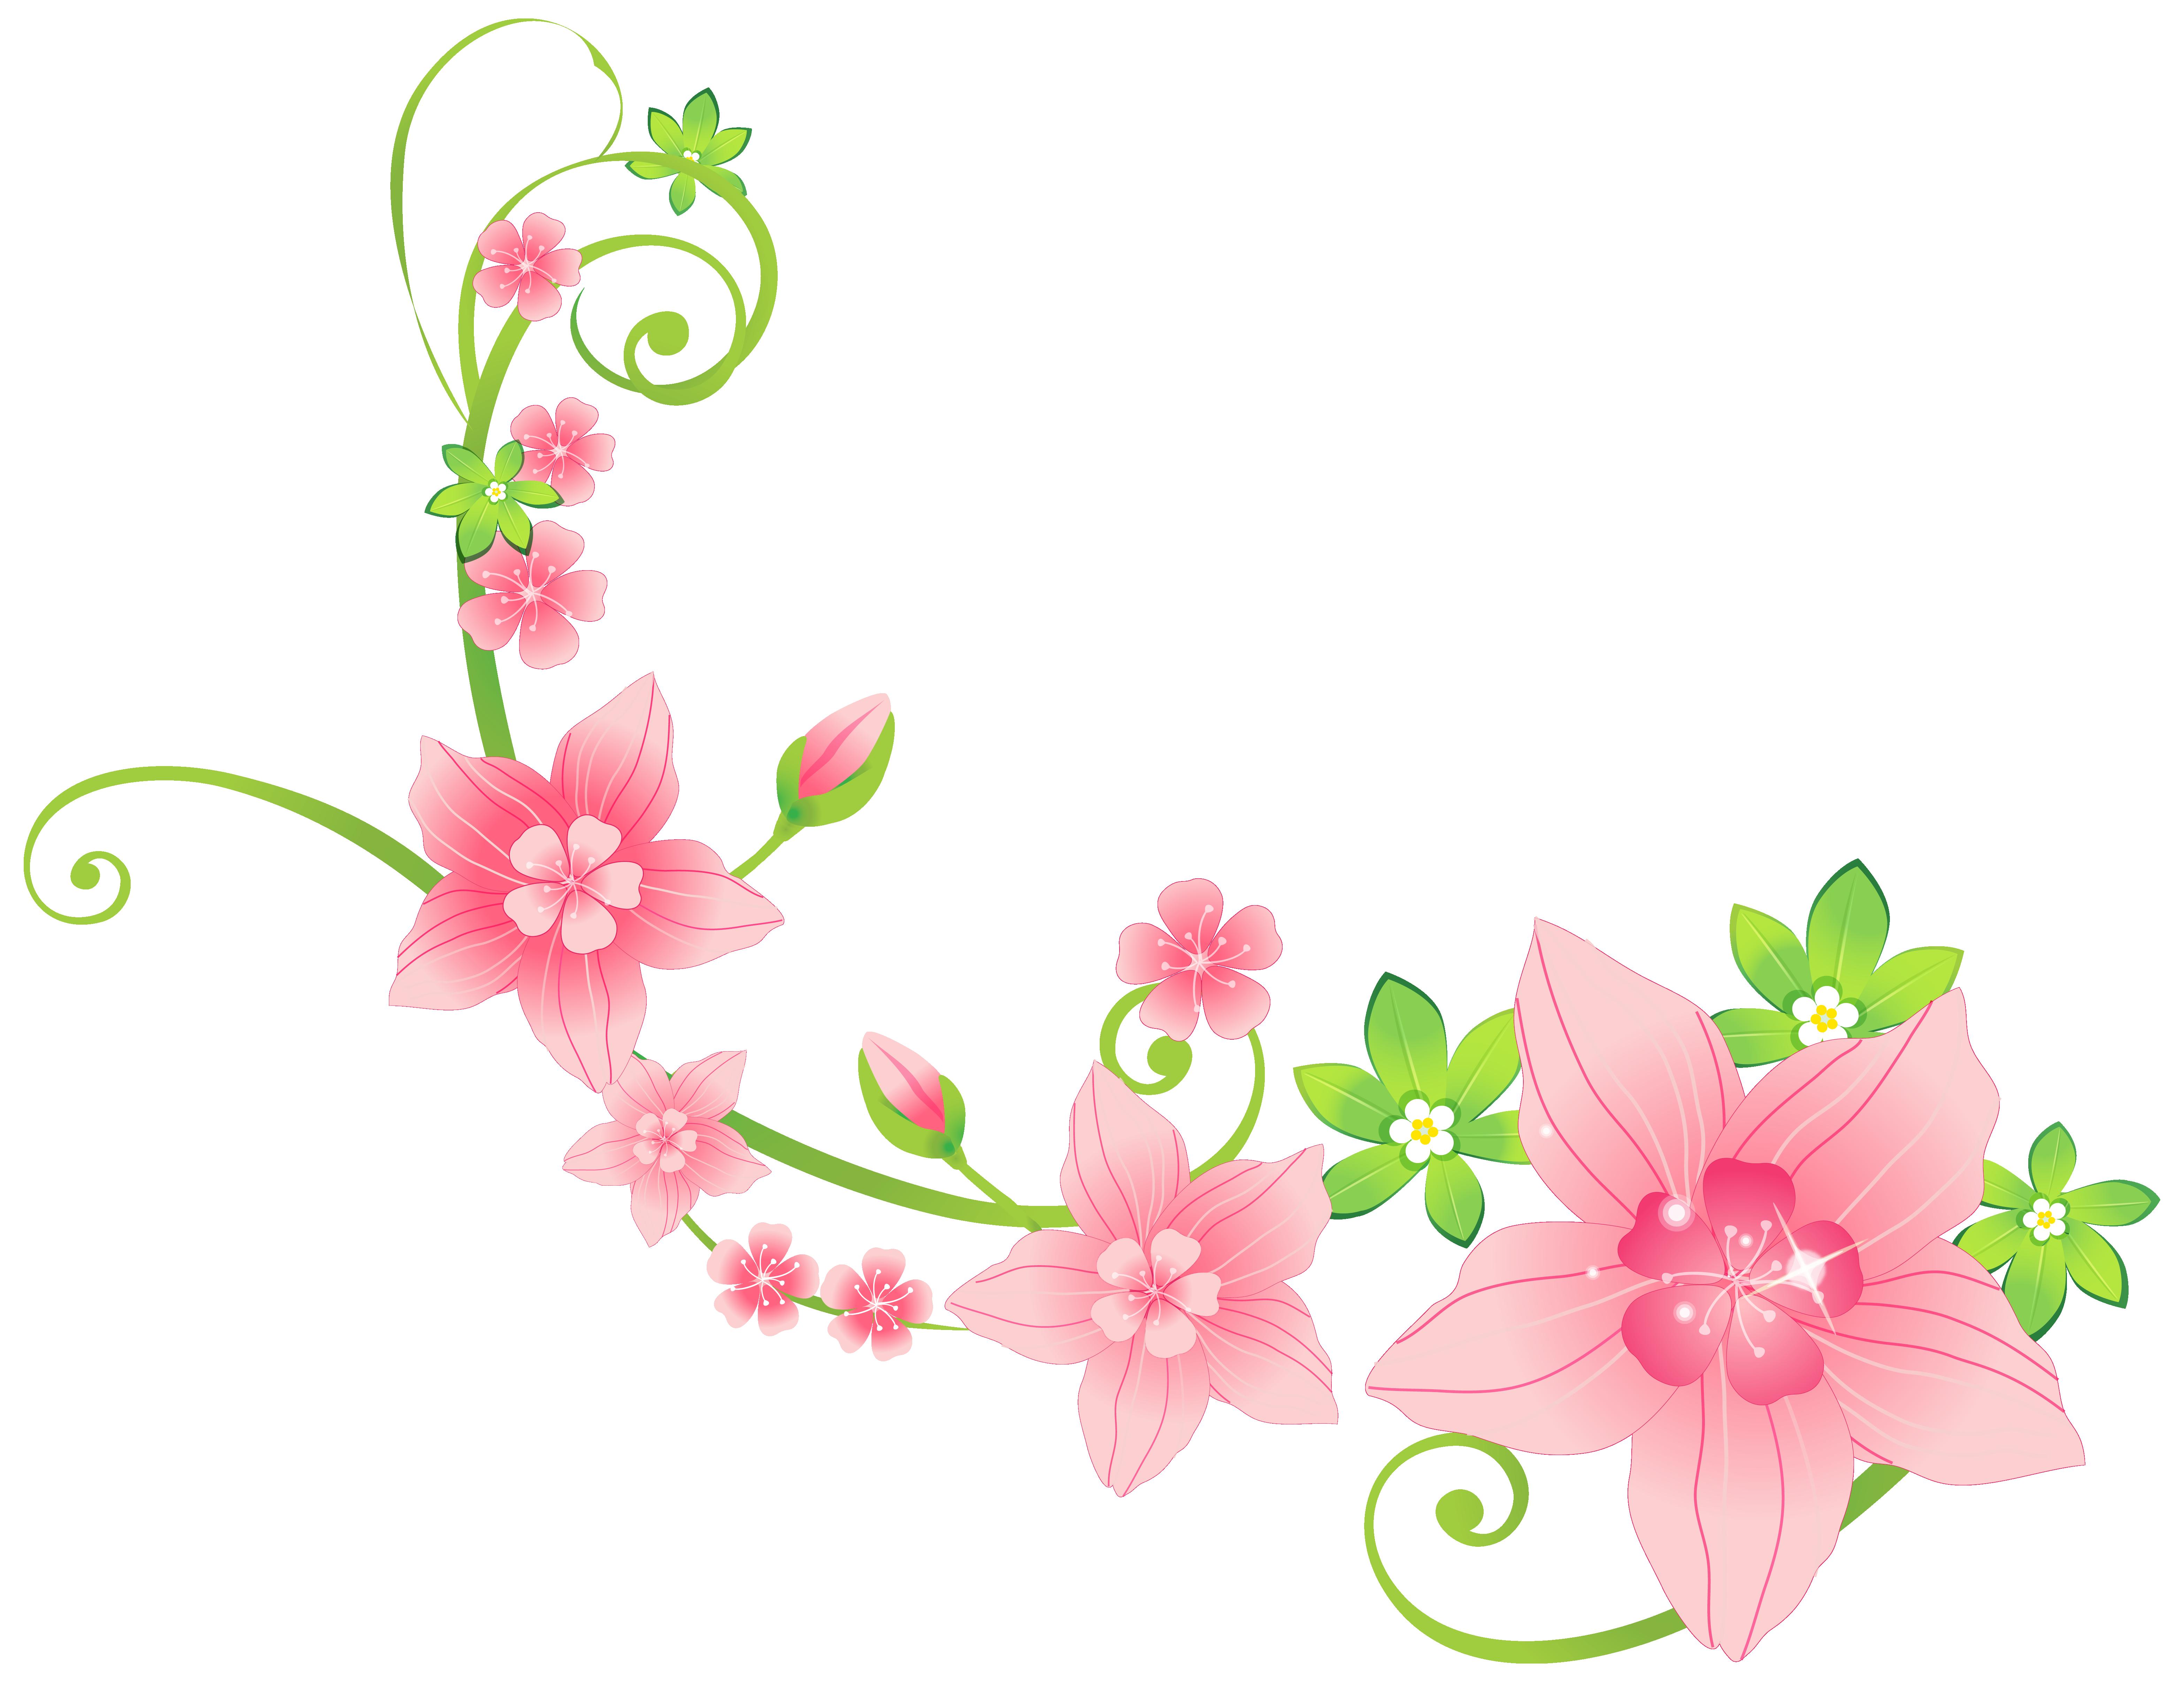 Floral Png Transparent Floralg Images Pluspng